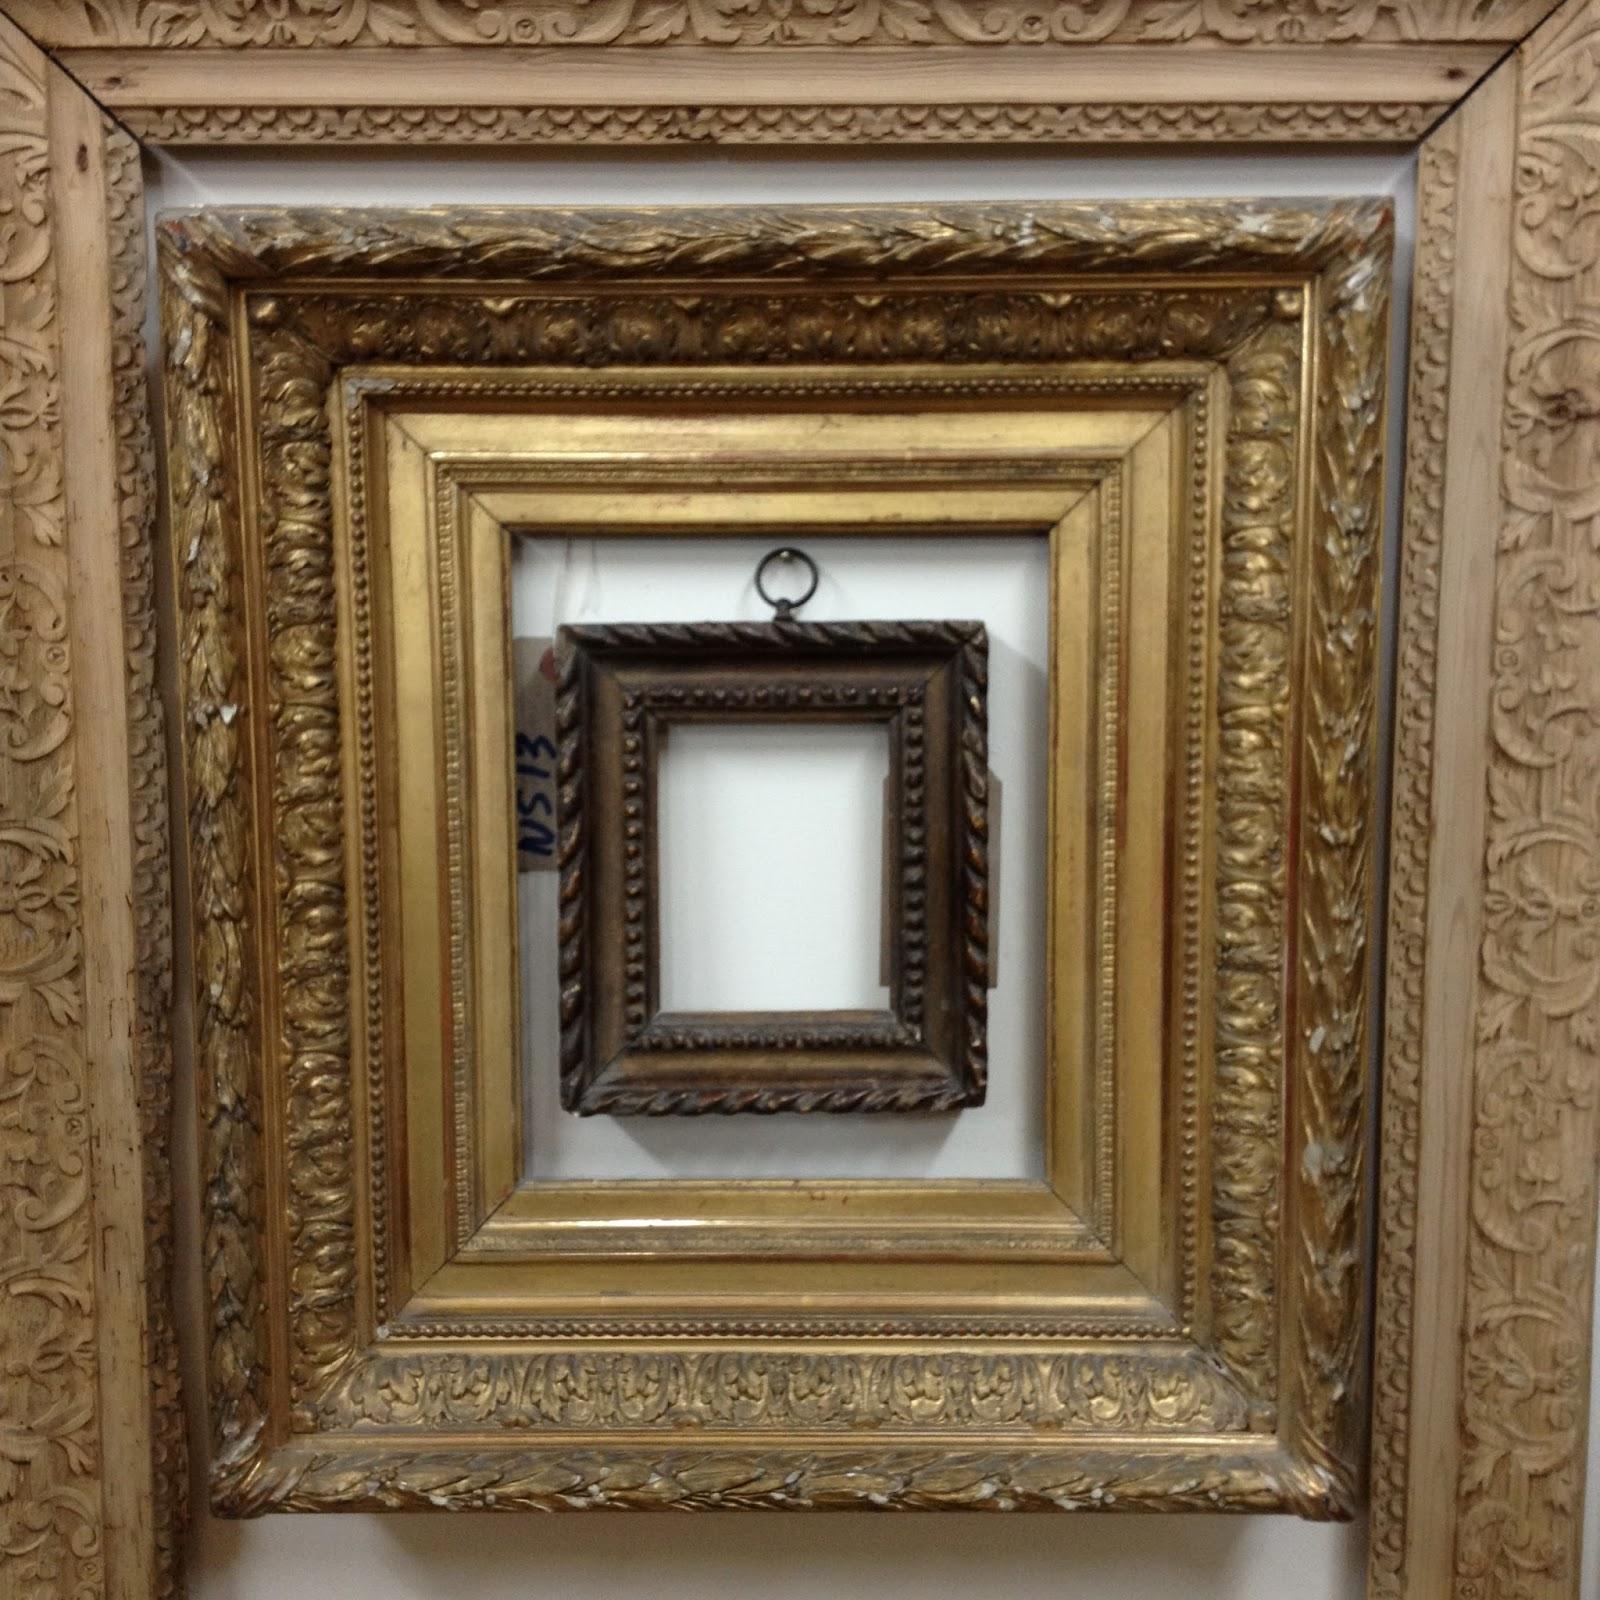 Framemaker: Antique Frames within Frames